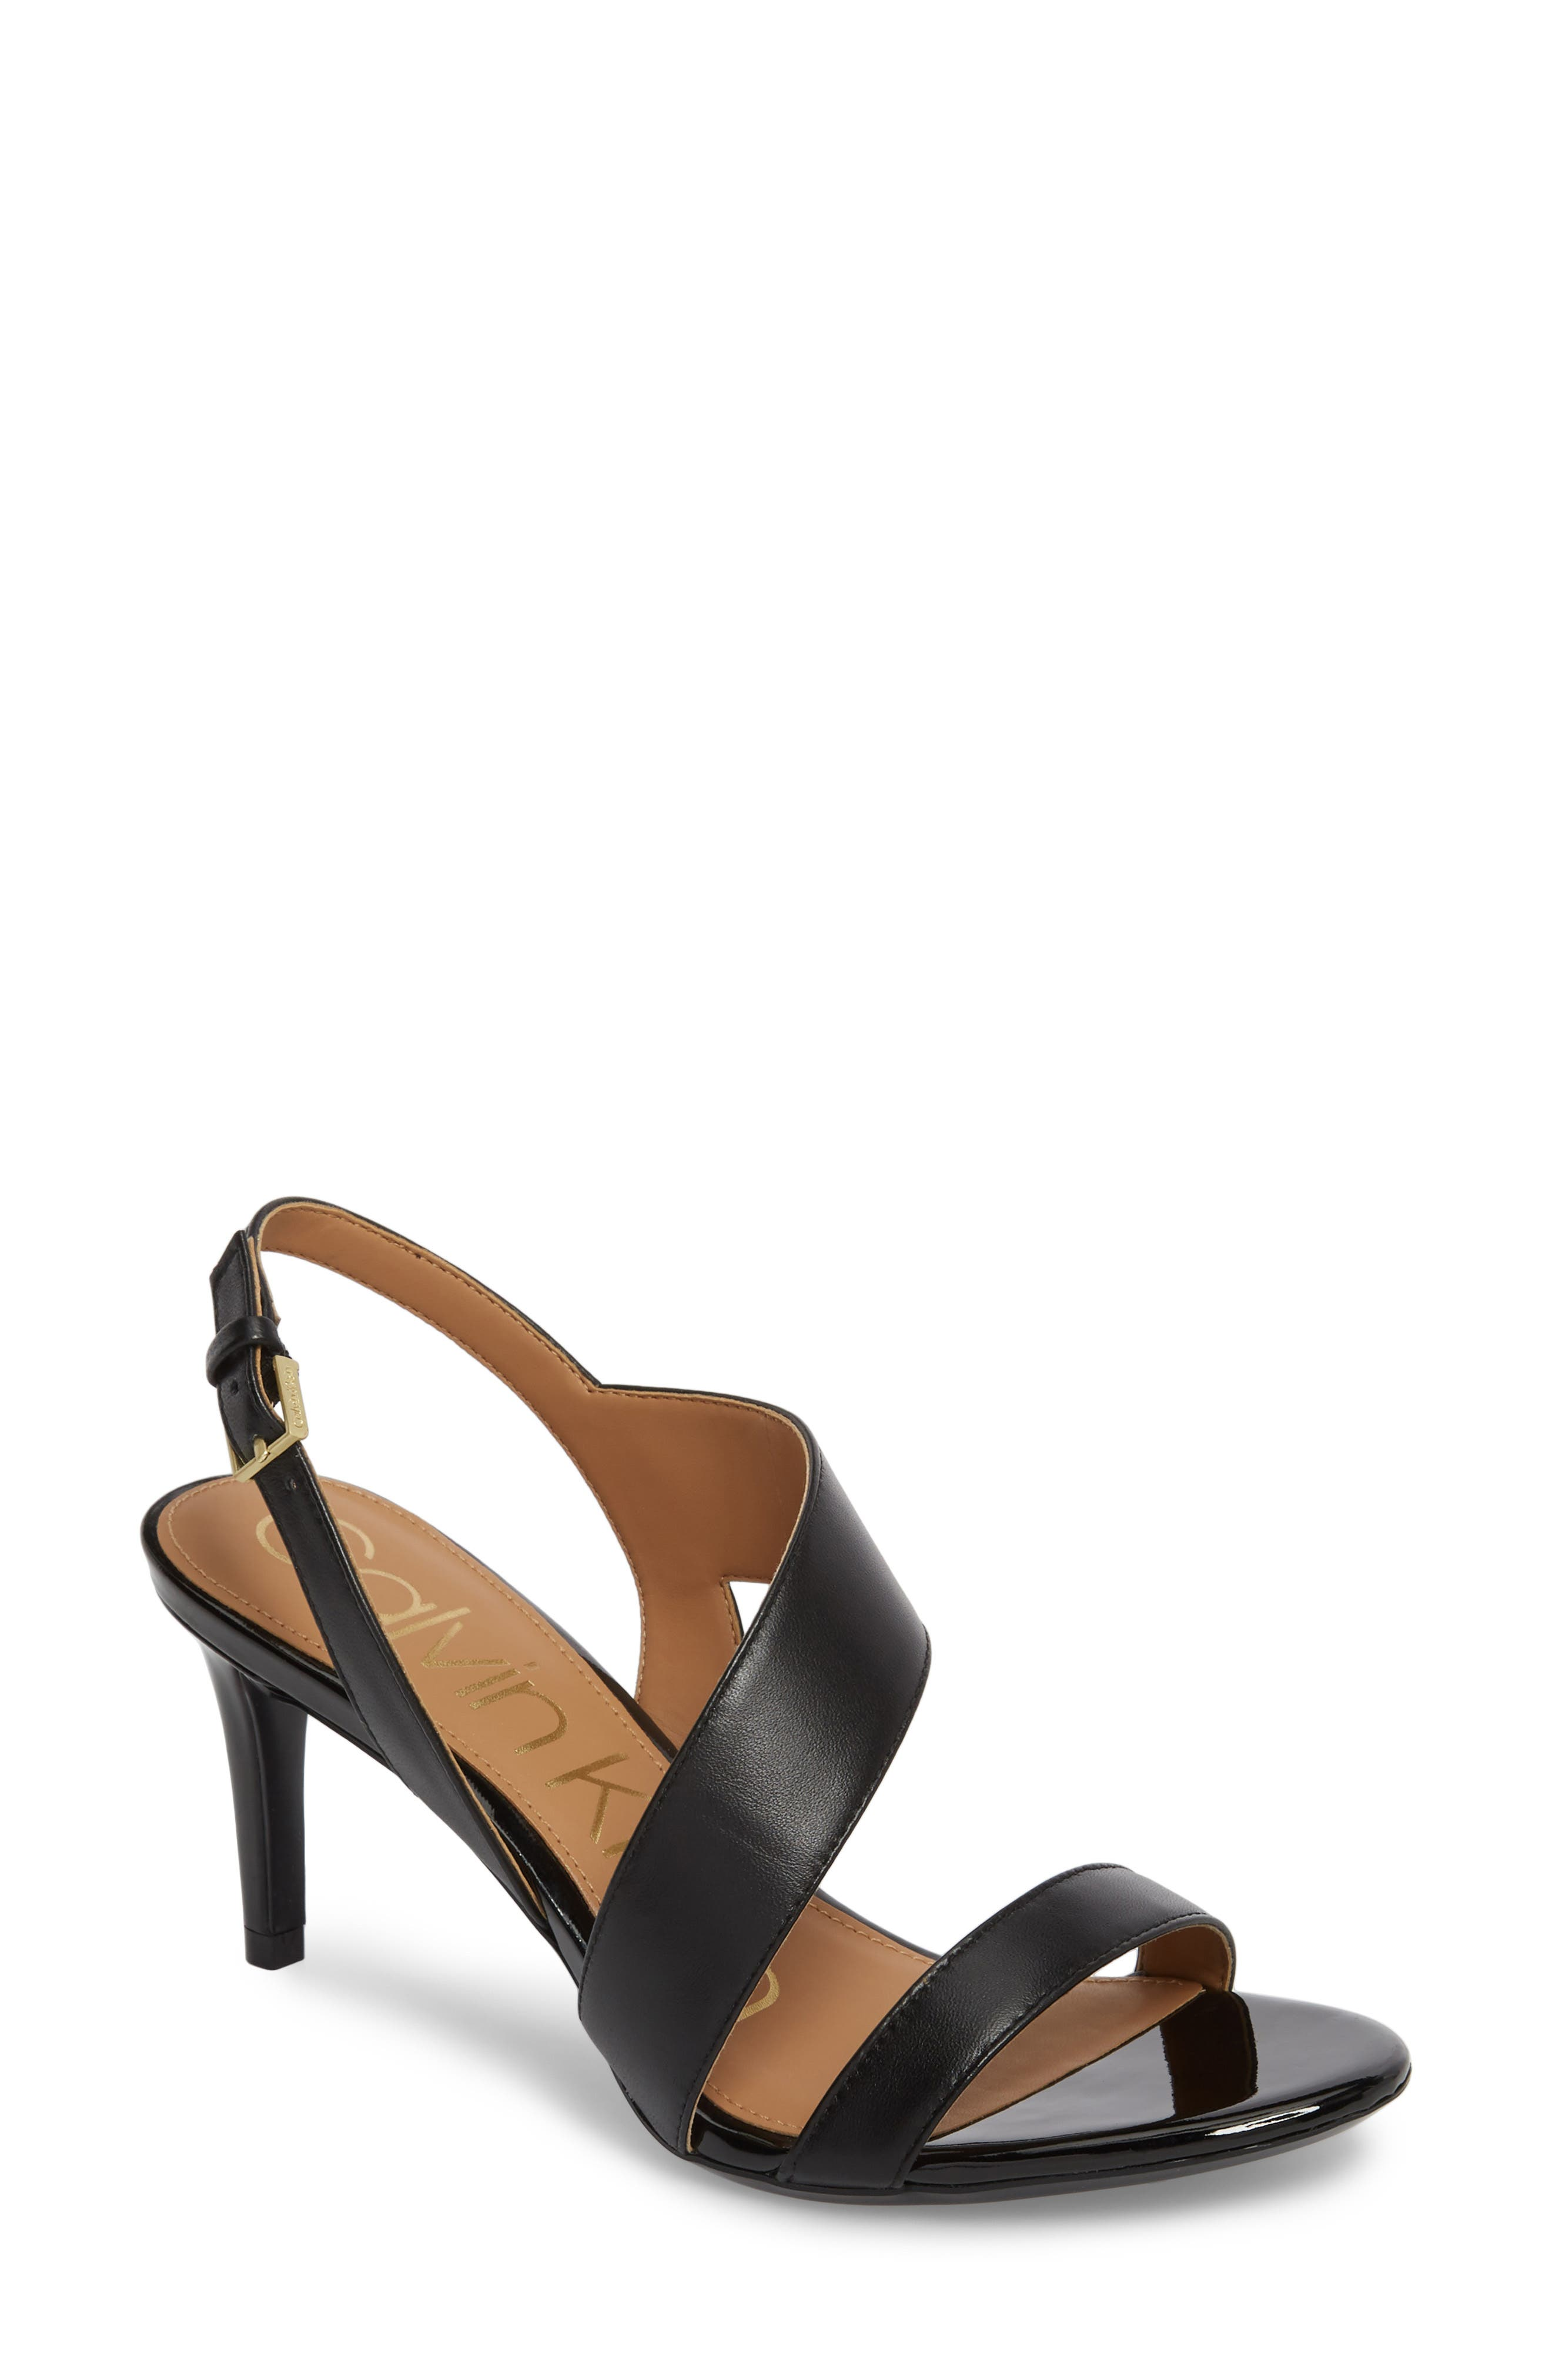 CALVIN KLEIN Lancy Sandal, Main, color, BLACK LEATHER